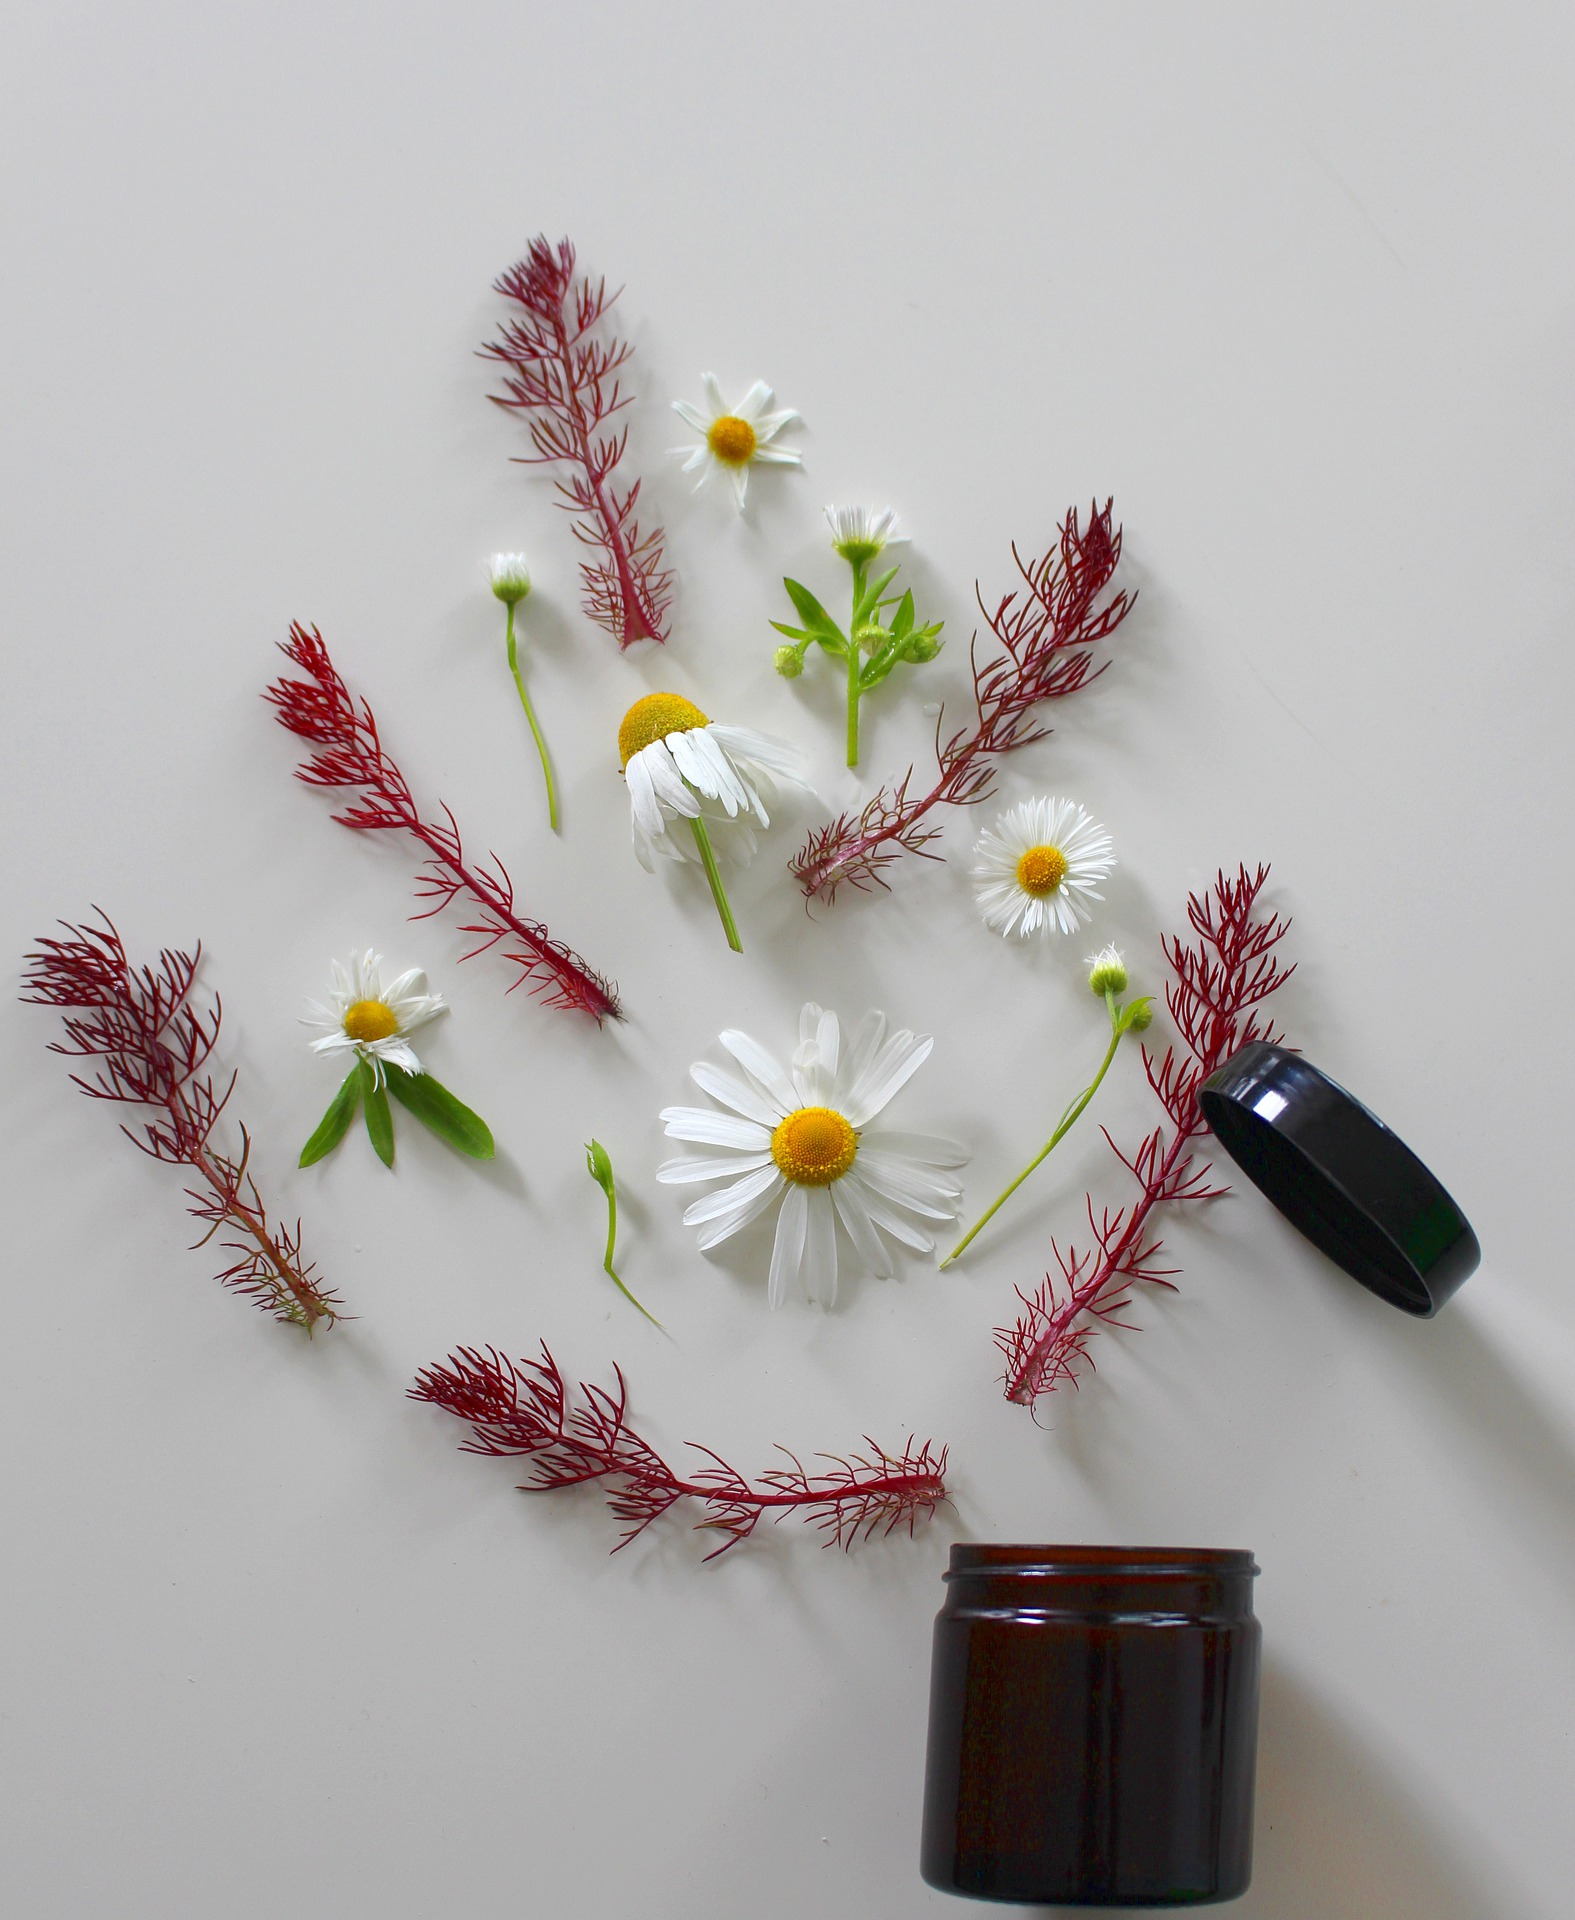 medicinal-flower-4246065_1920